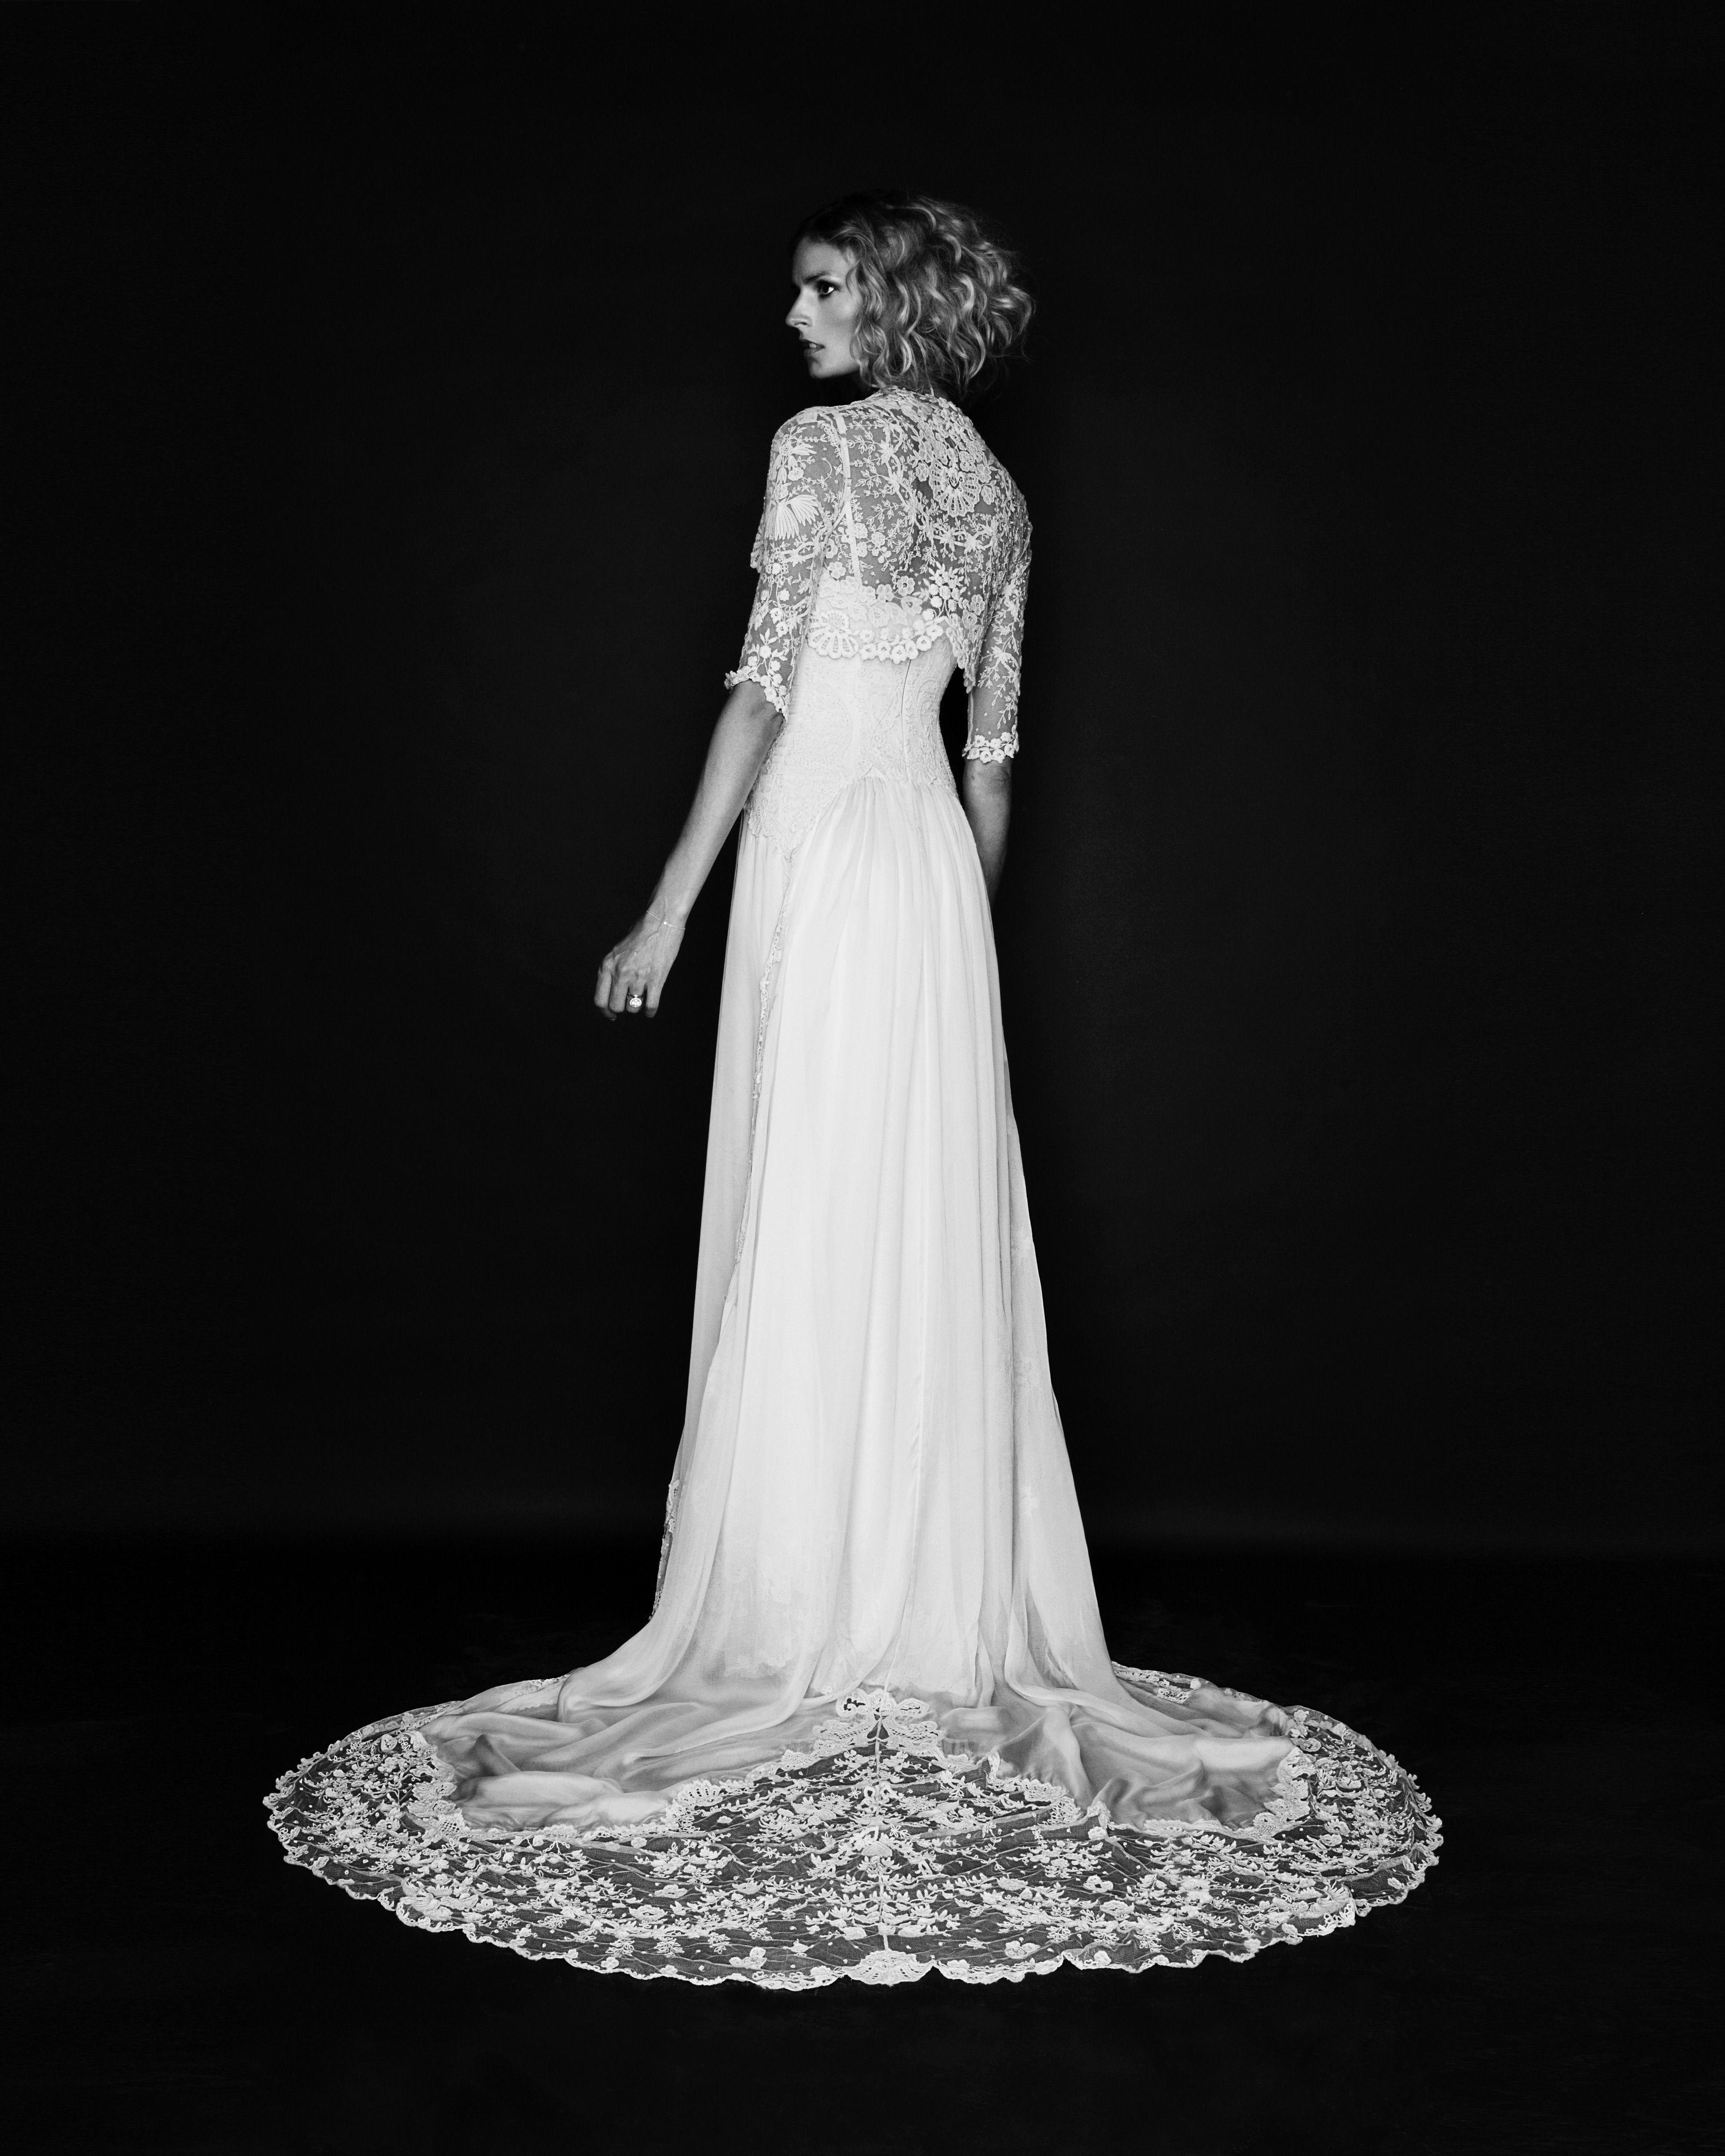 Jacquetta Wheeler In Bespoke Temperley Bridal